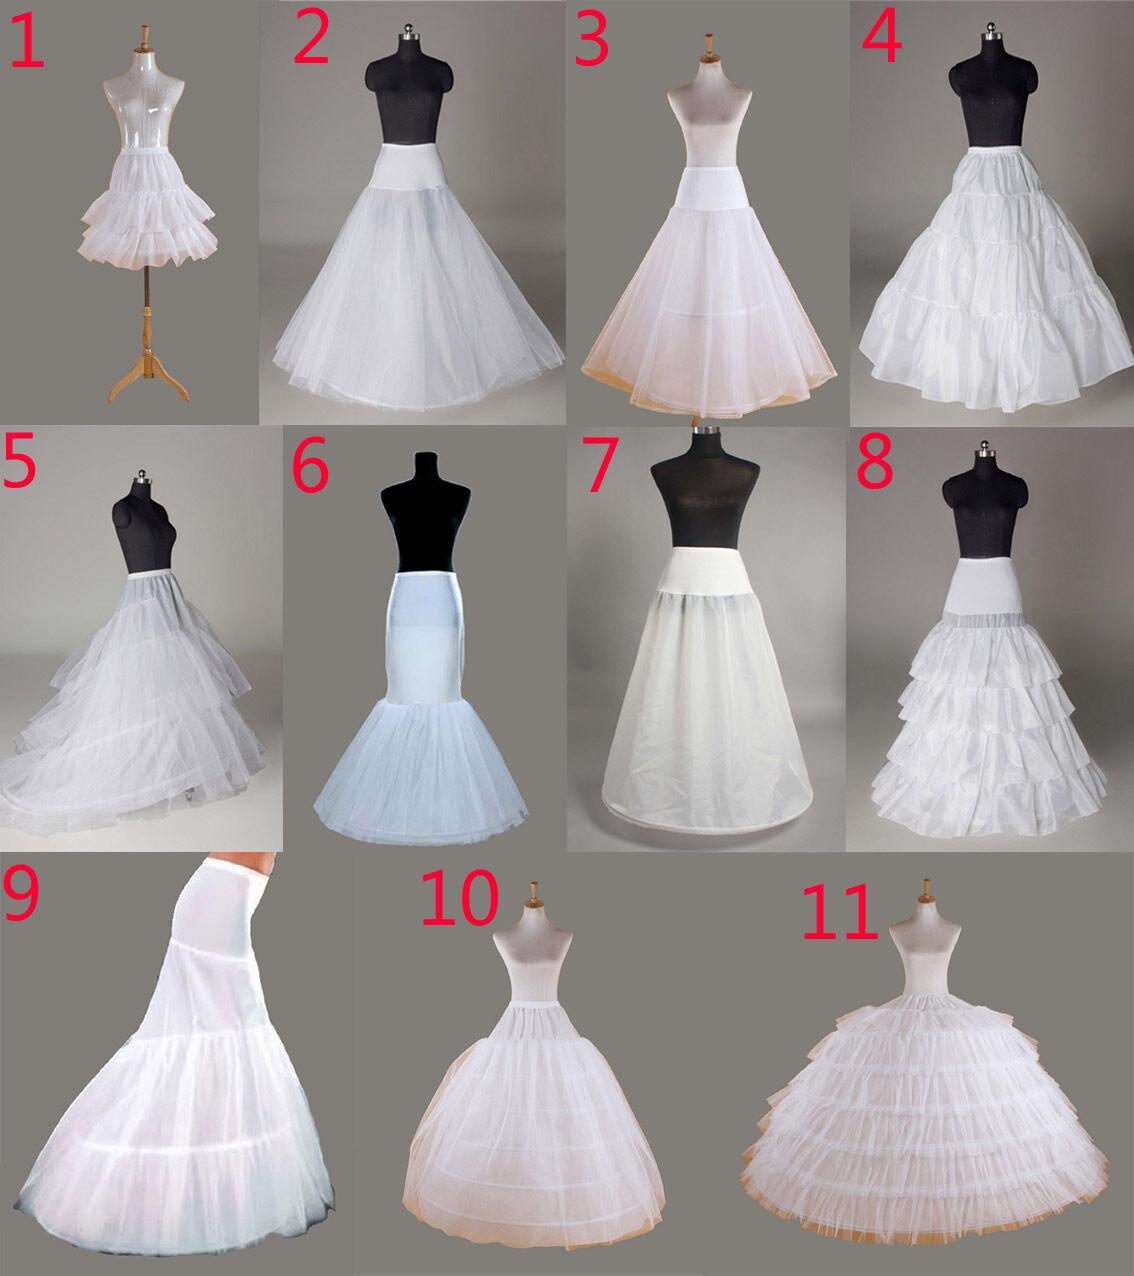 Petticoat Crinoline Hoop Underskirt Wedding Petticoat Fishtail Mermaid Prom